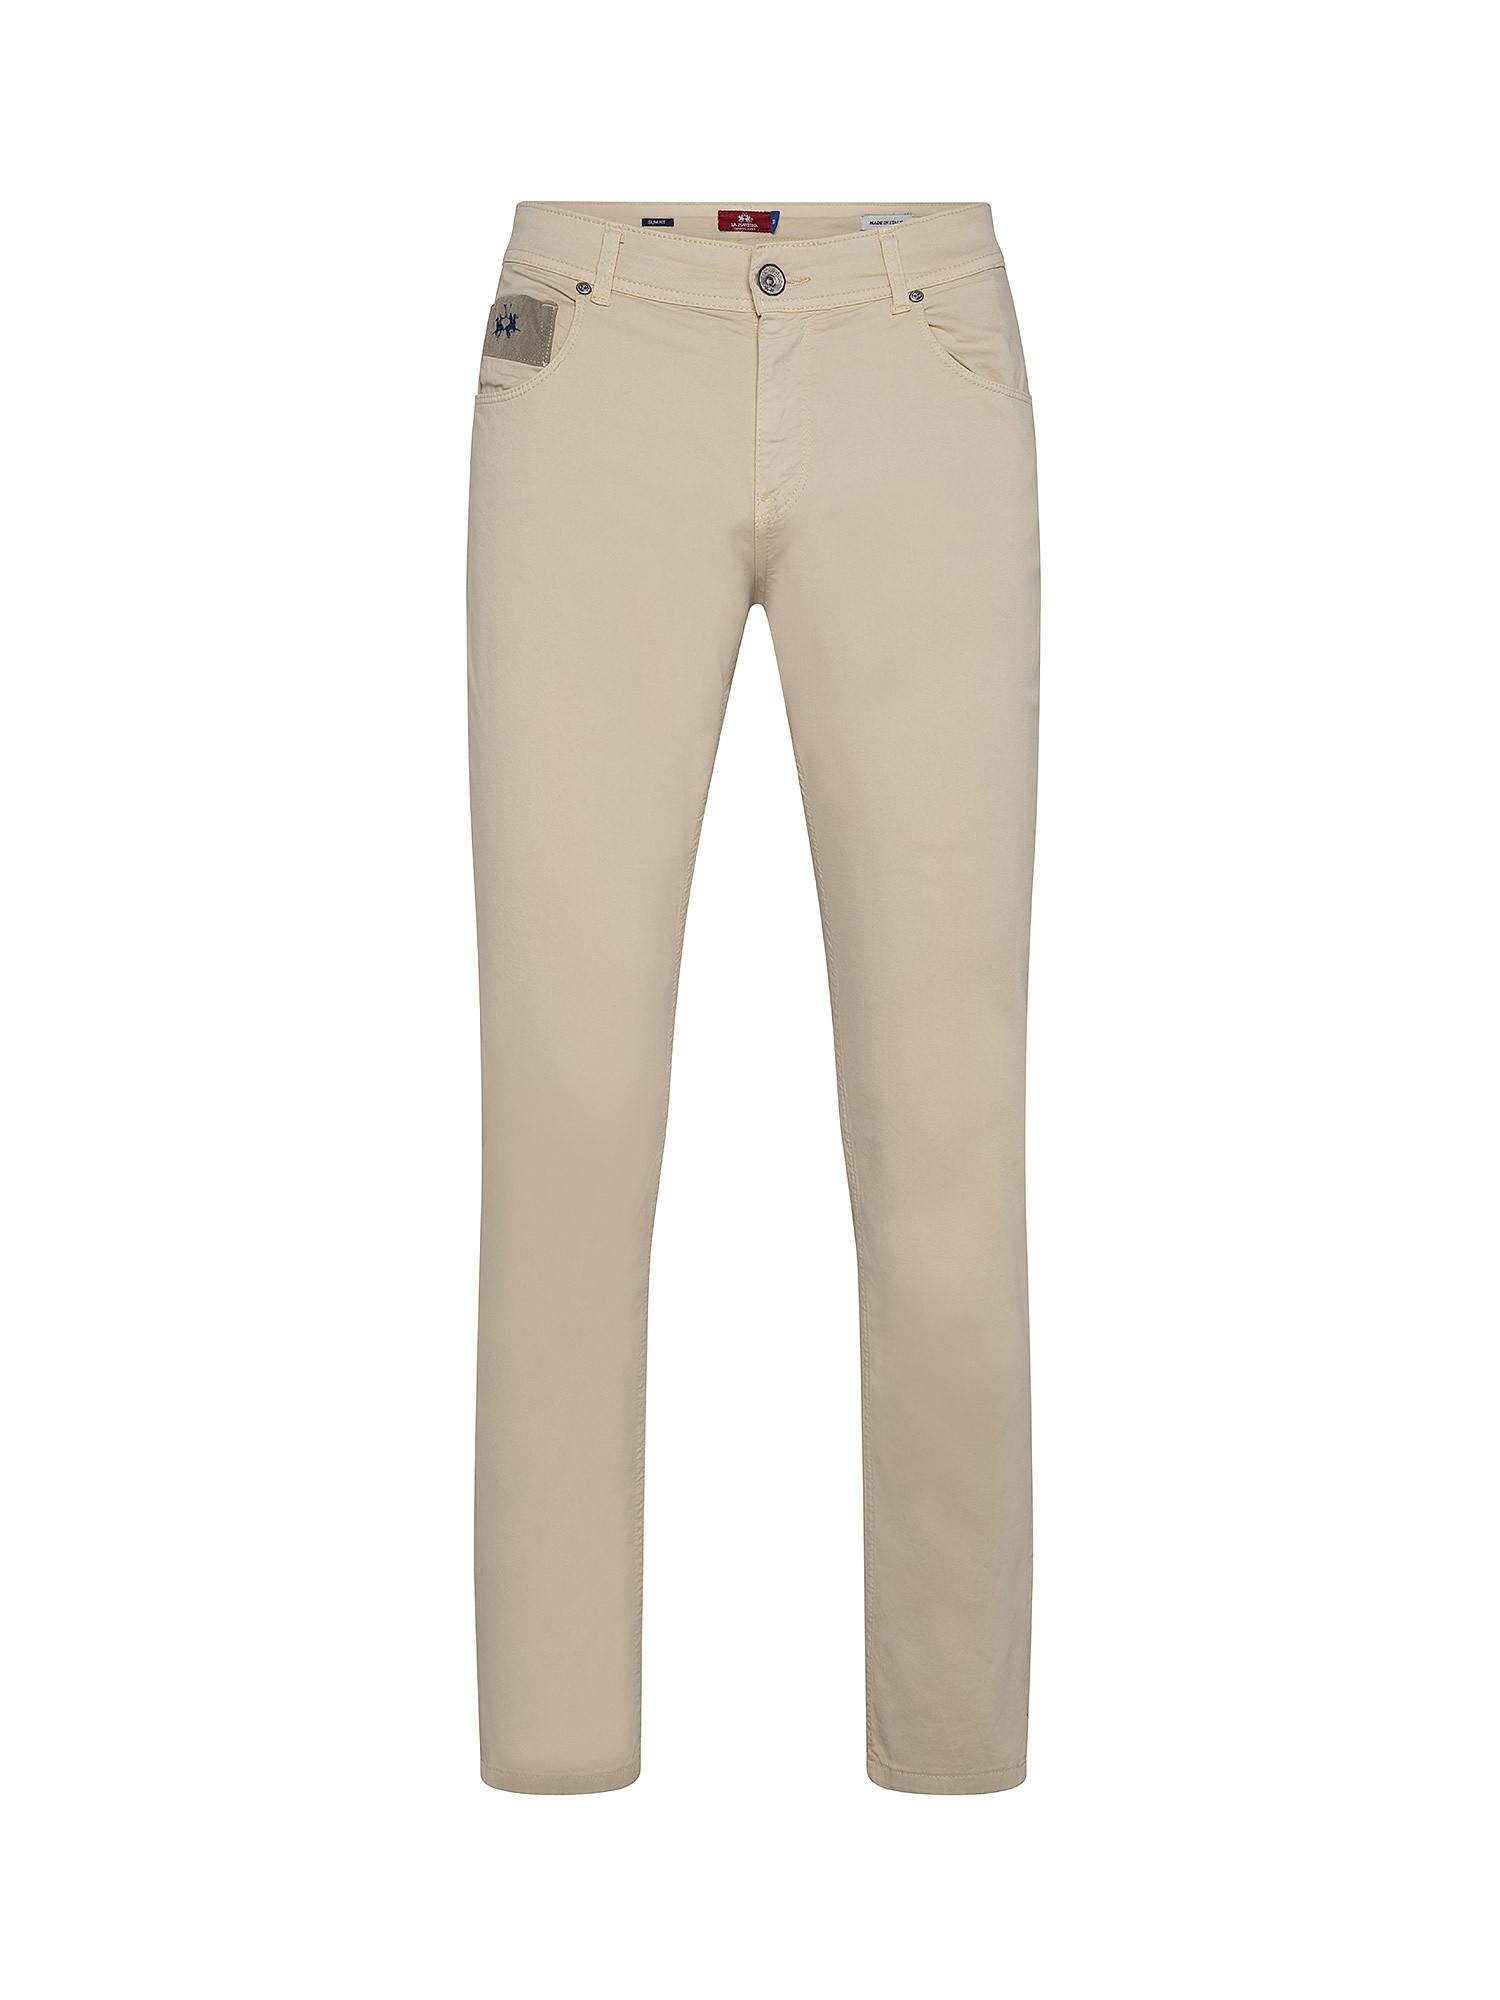 Pantalone da uomo in cotone elasticizzato slim fit, Beige, large image number 0